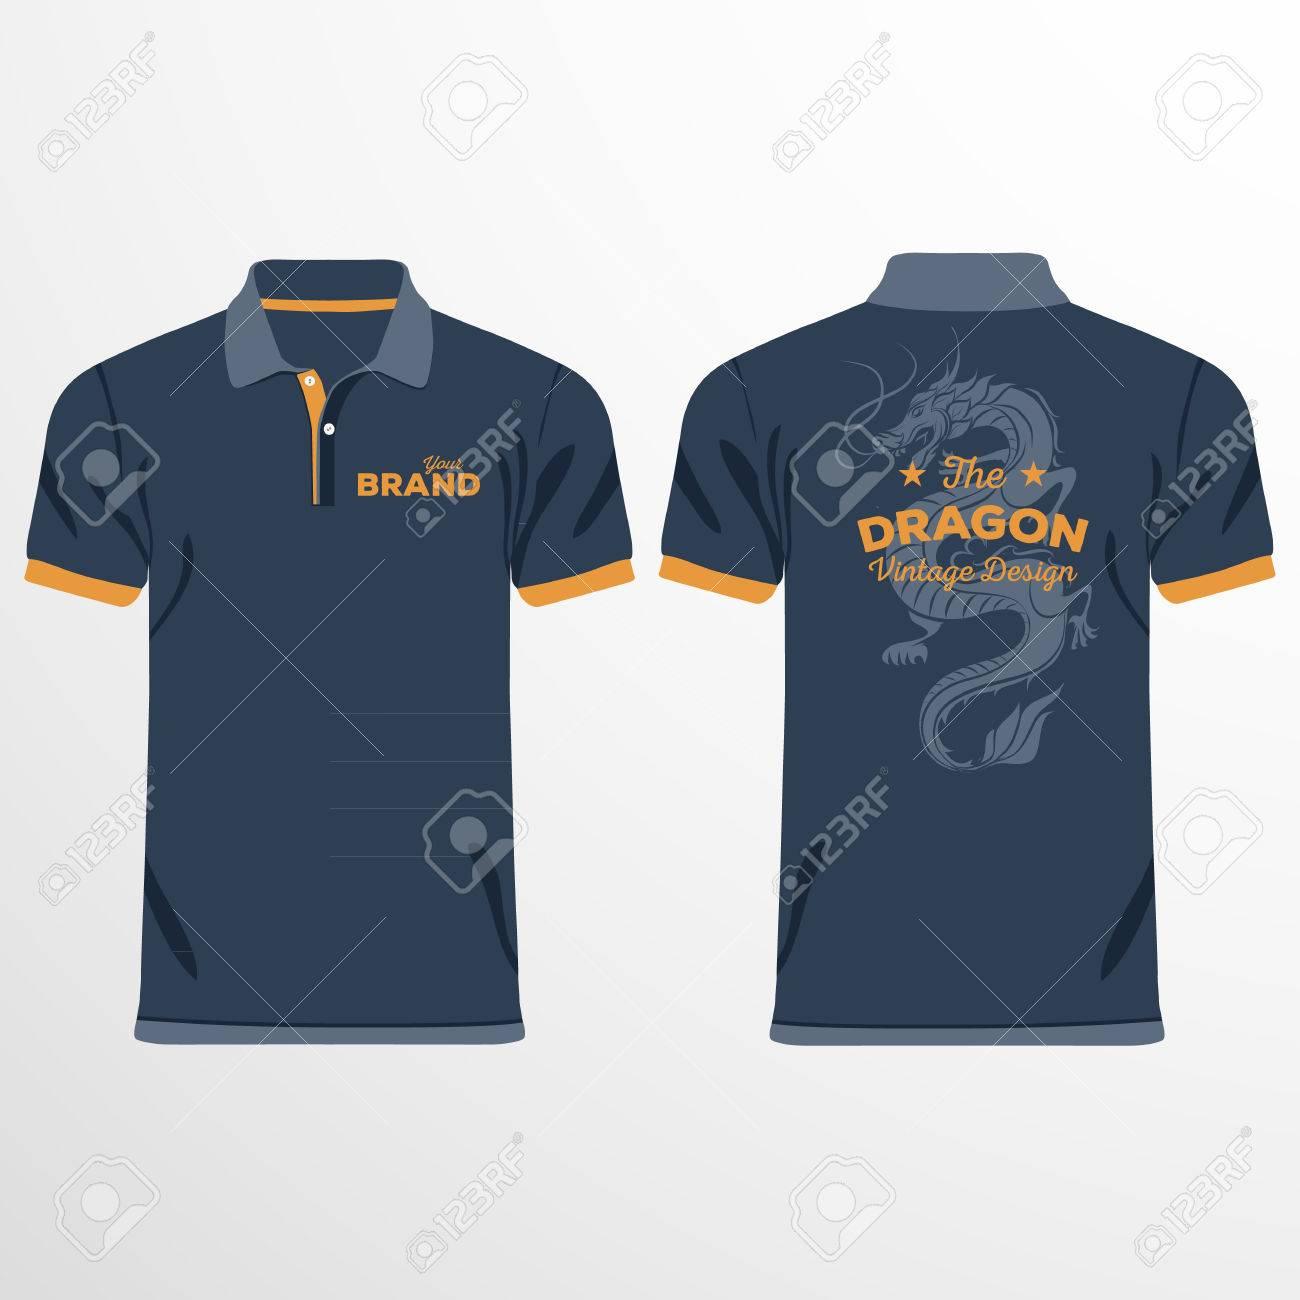 Color Men Polo Shirts Design Template Vector Illustration Royalty